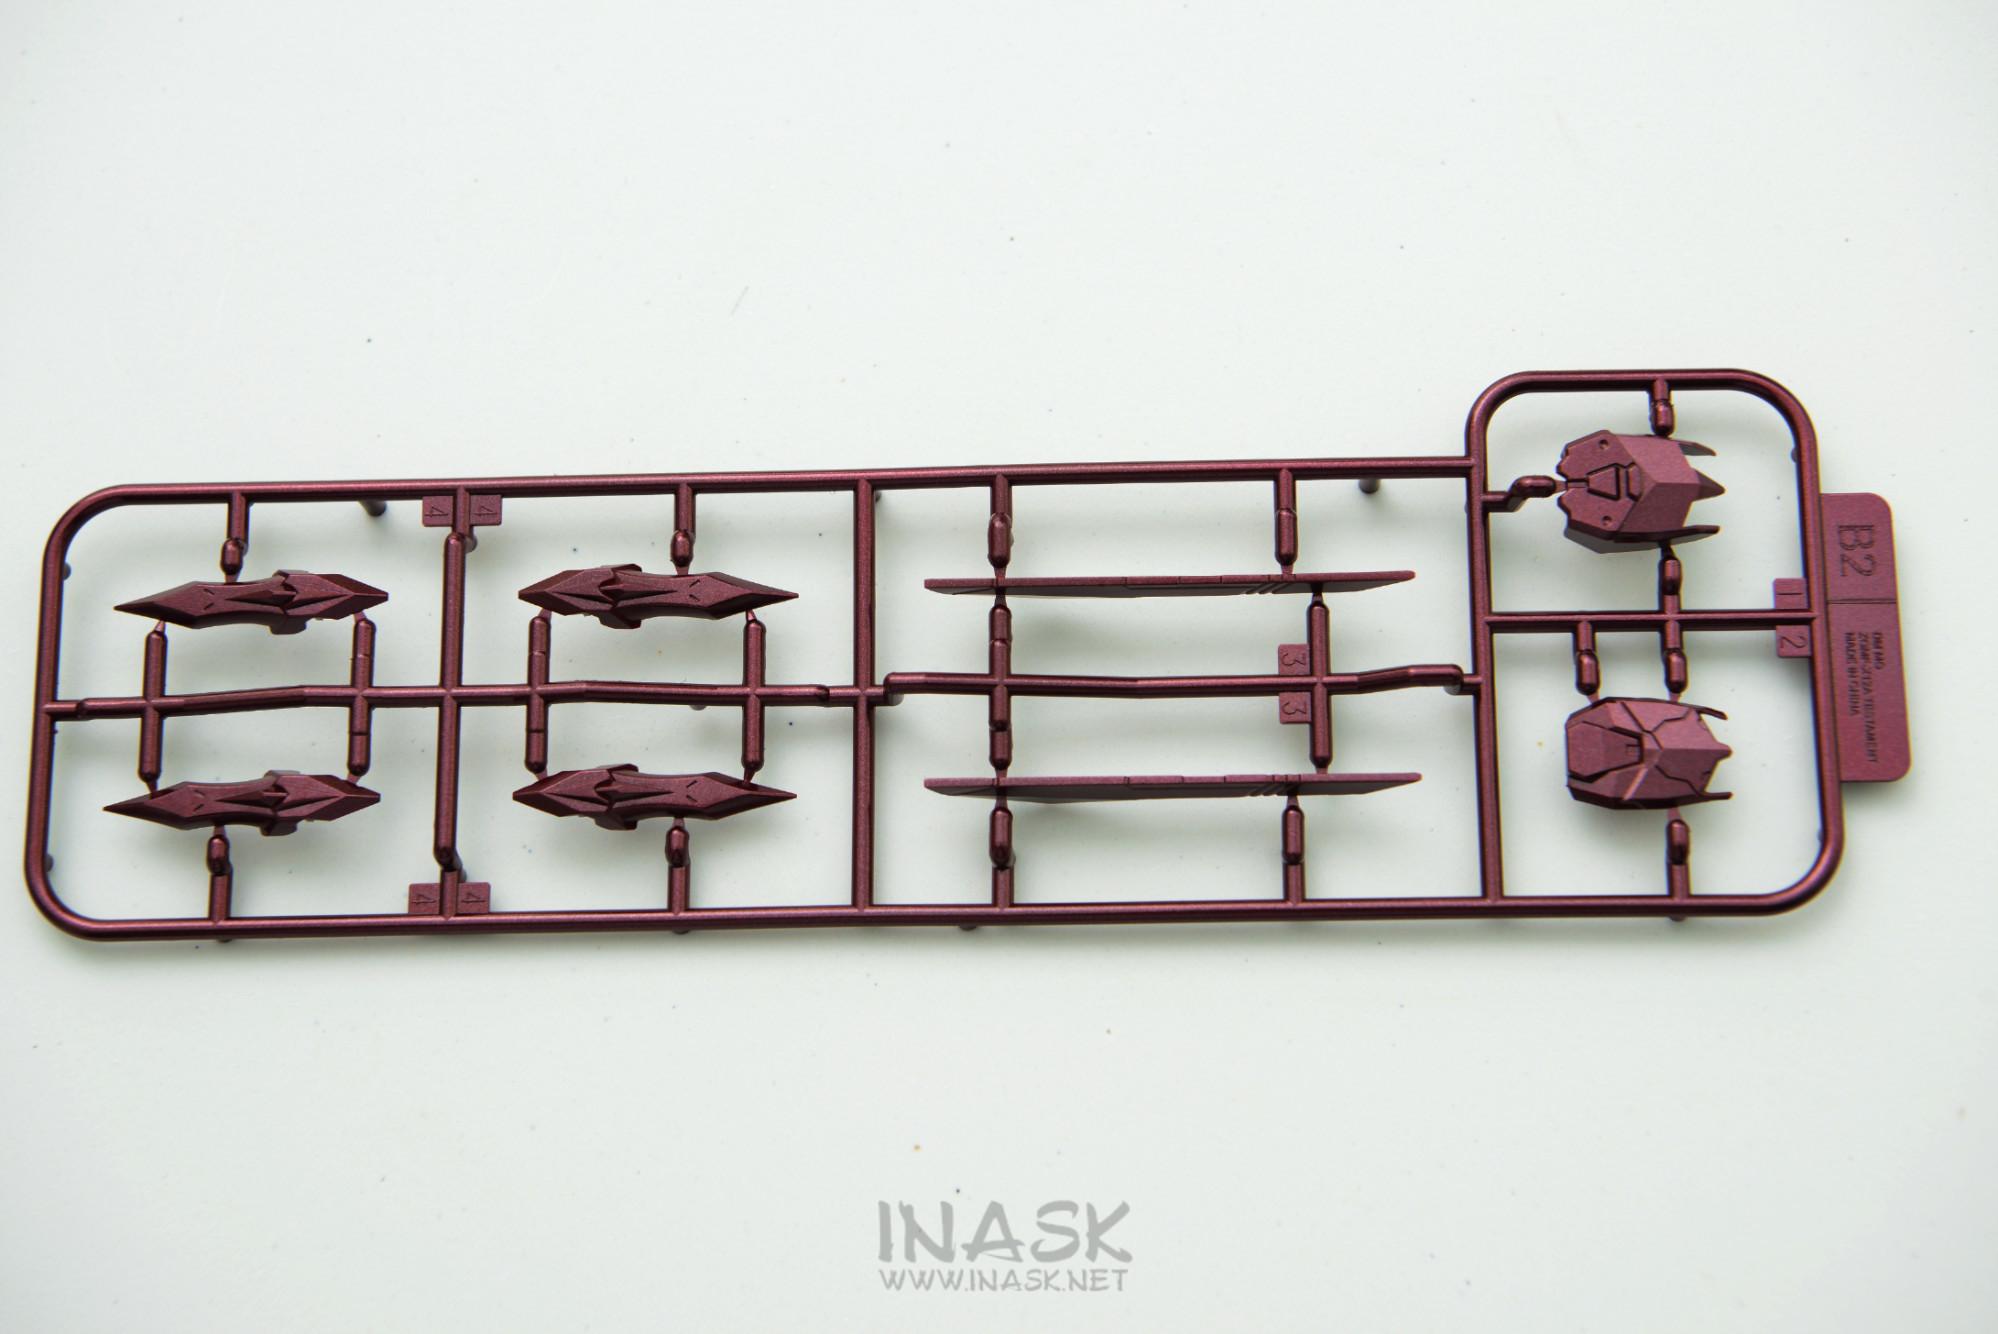 S181_2_inask_info_8.jpg